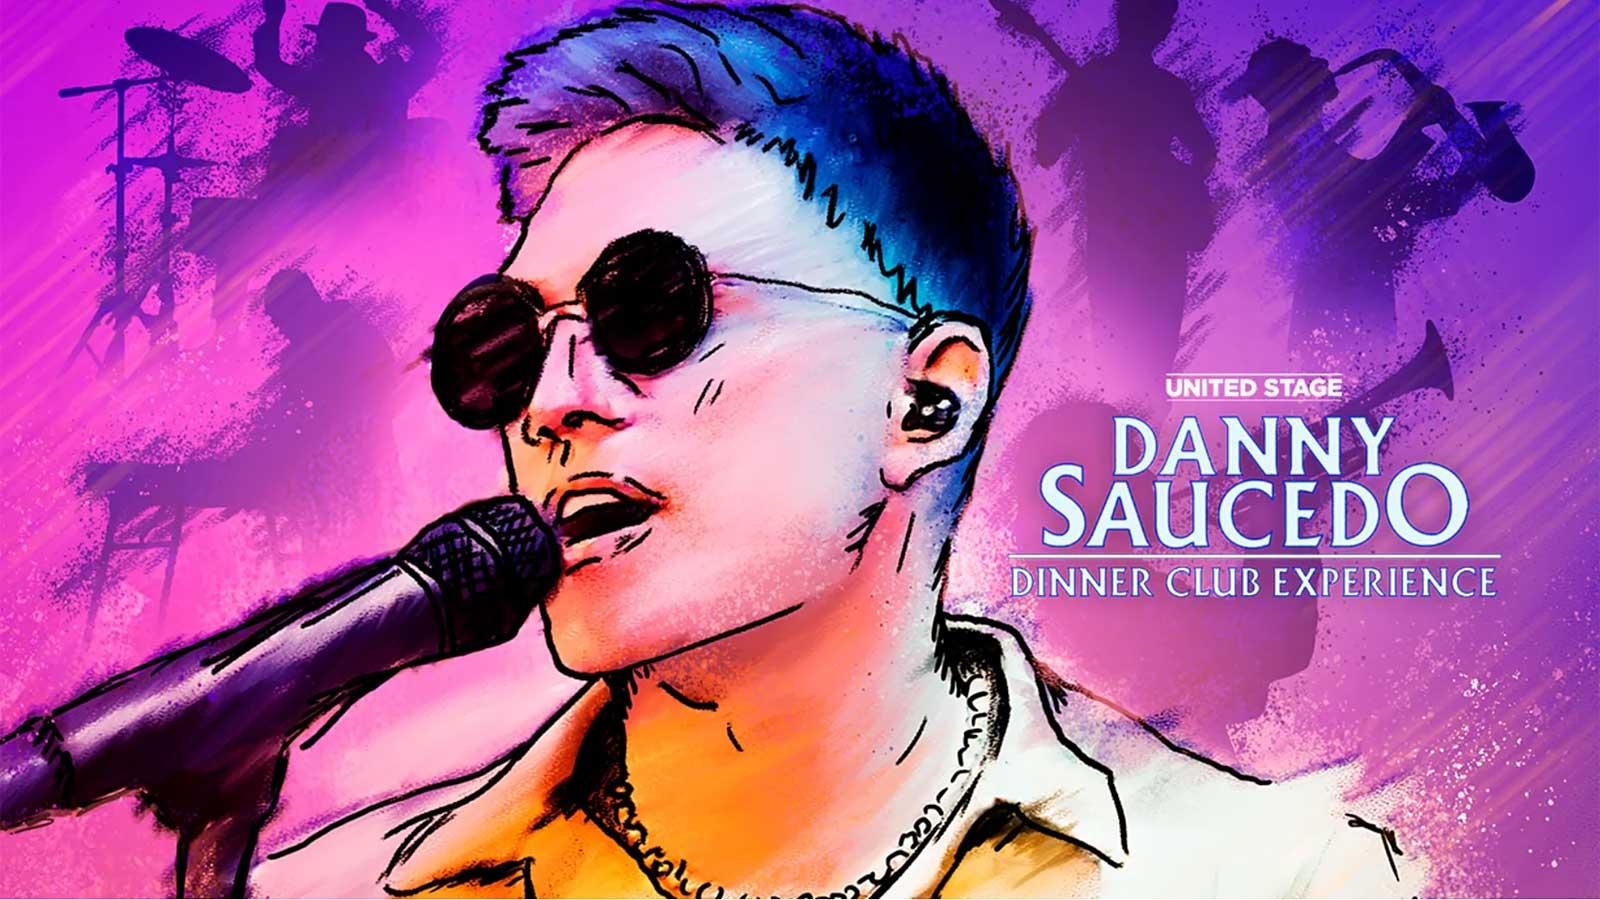 Danny Saucedo - Dinner Club Experience